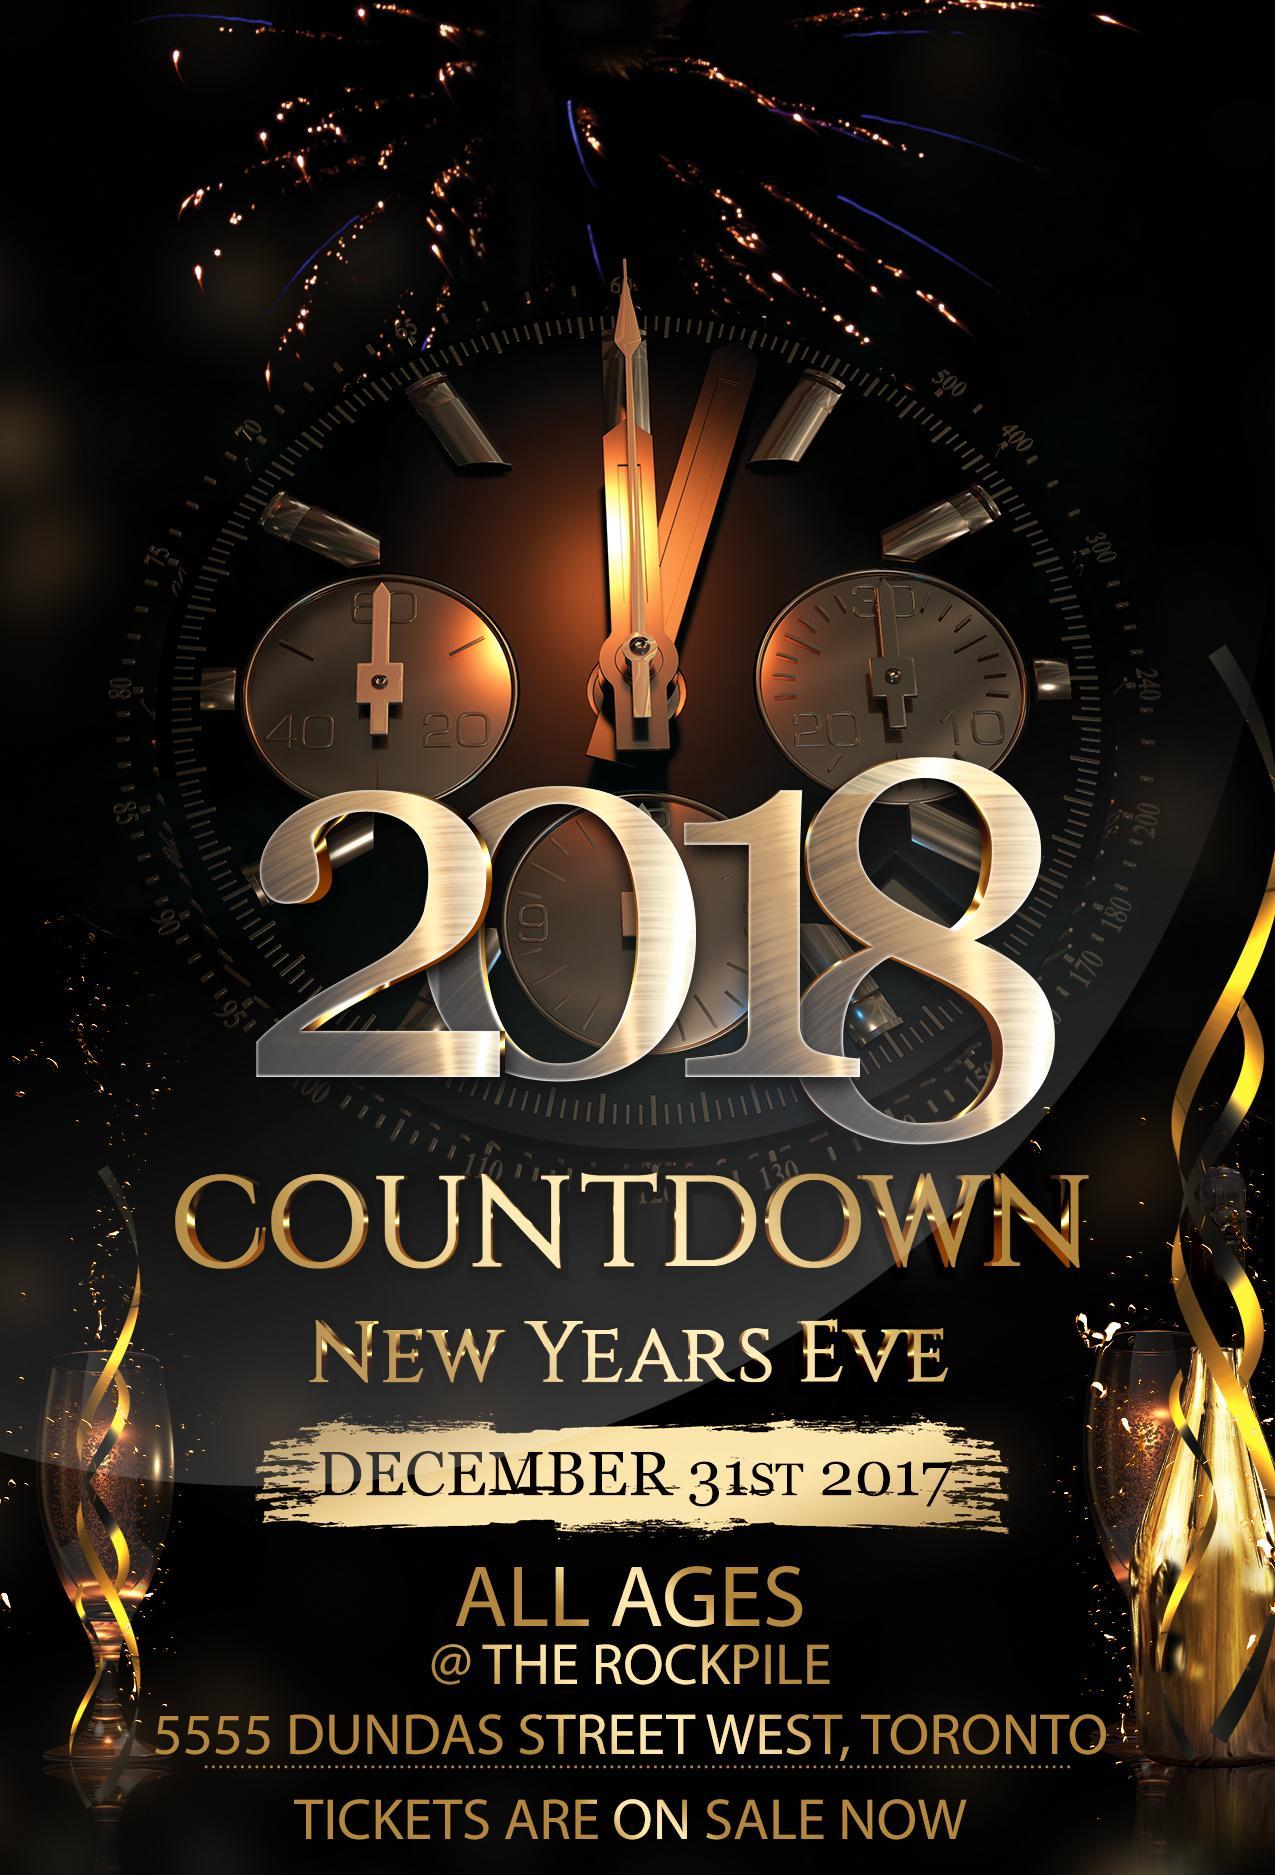 Rivers casino new years eve 2018 chicago